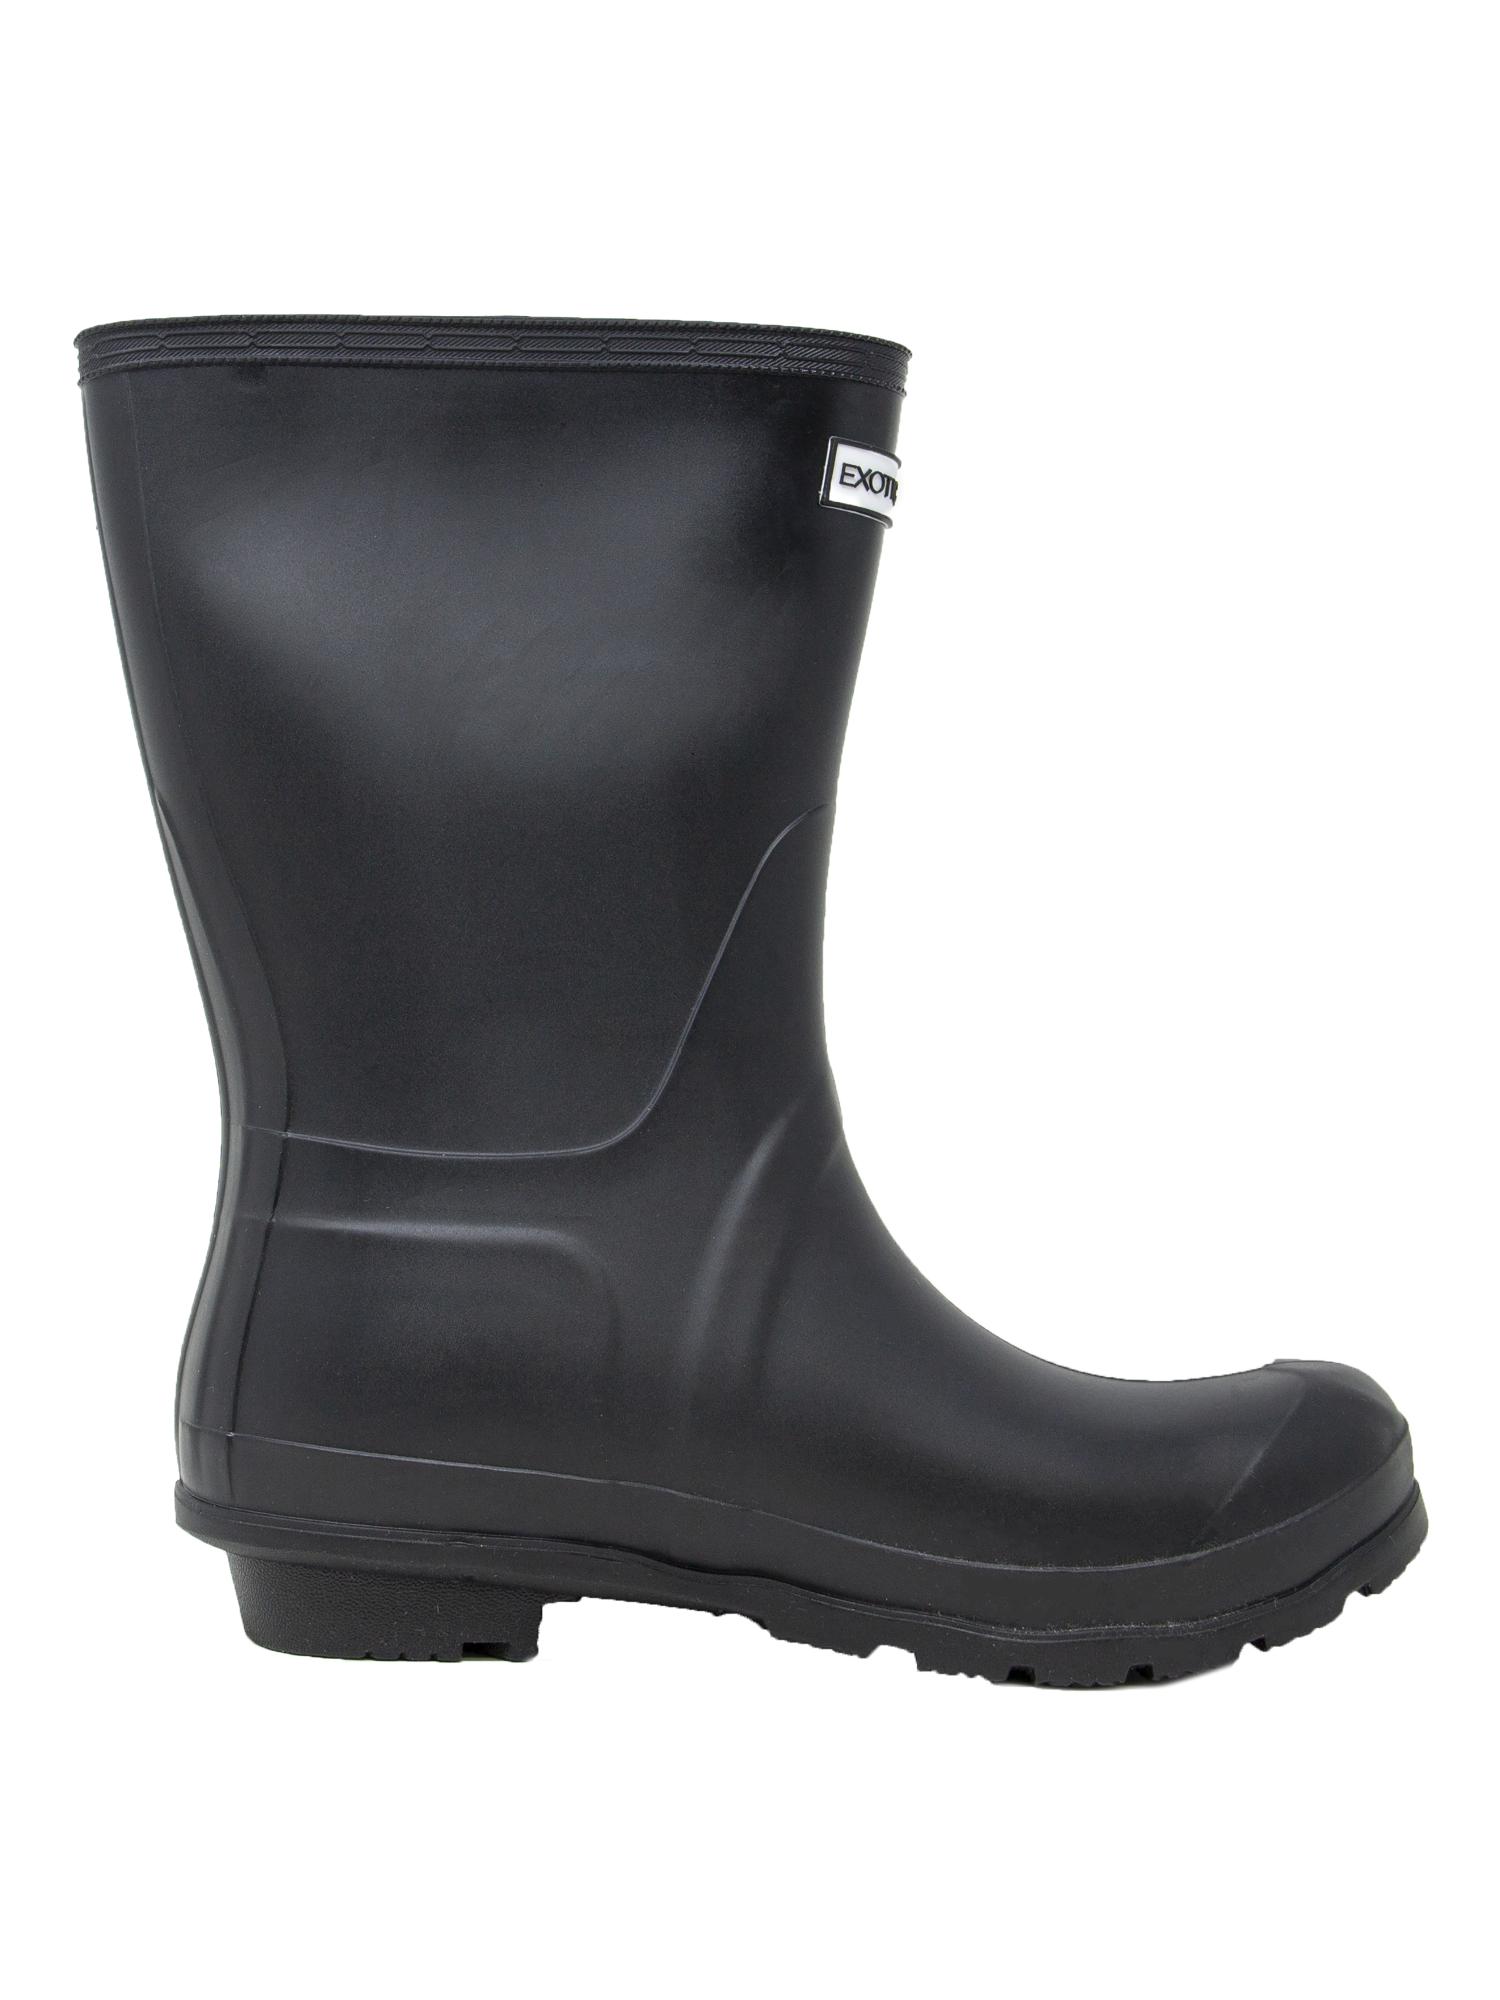 Exotic-Identity-Short-Rain-Boots-Non-Slip-100-Waterproof-for-Women thumbnail 5